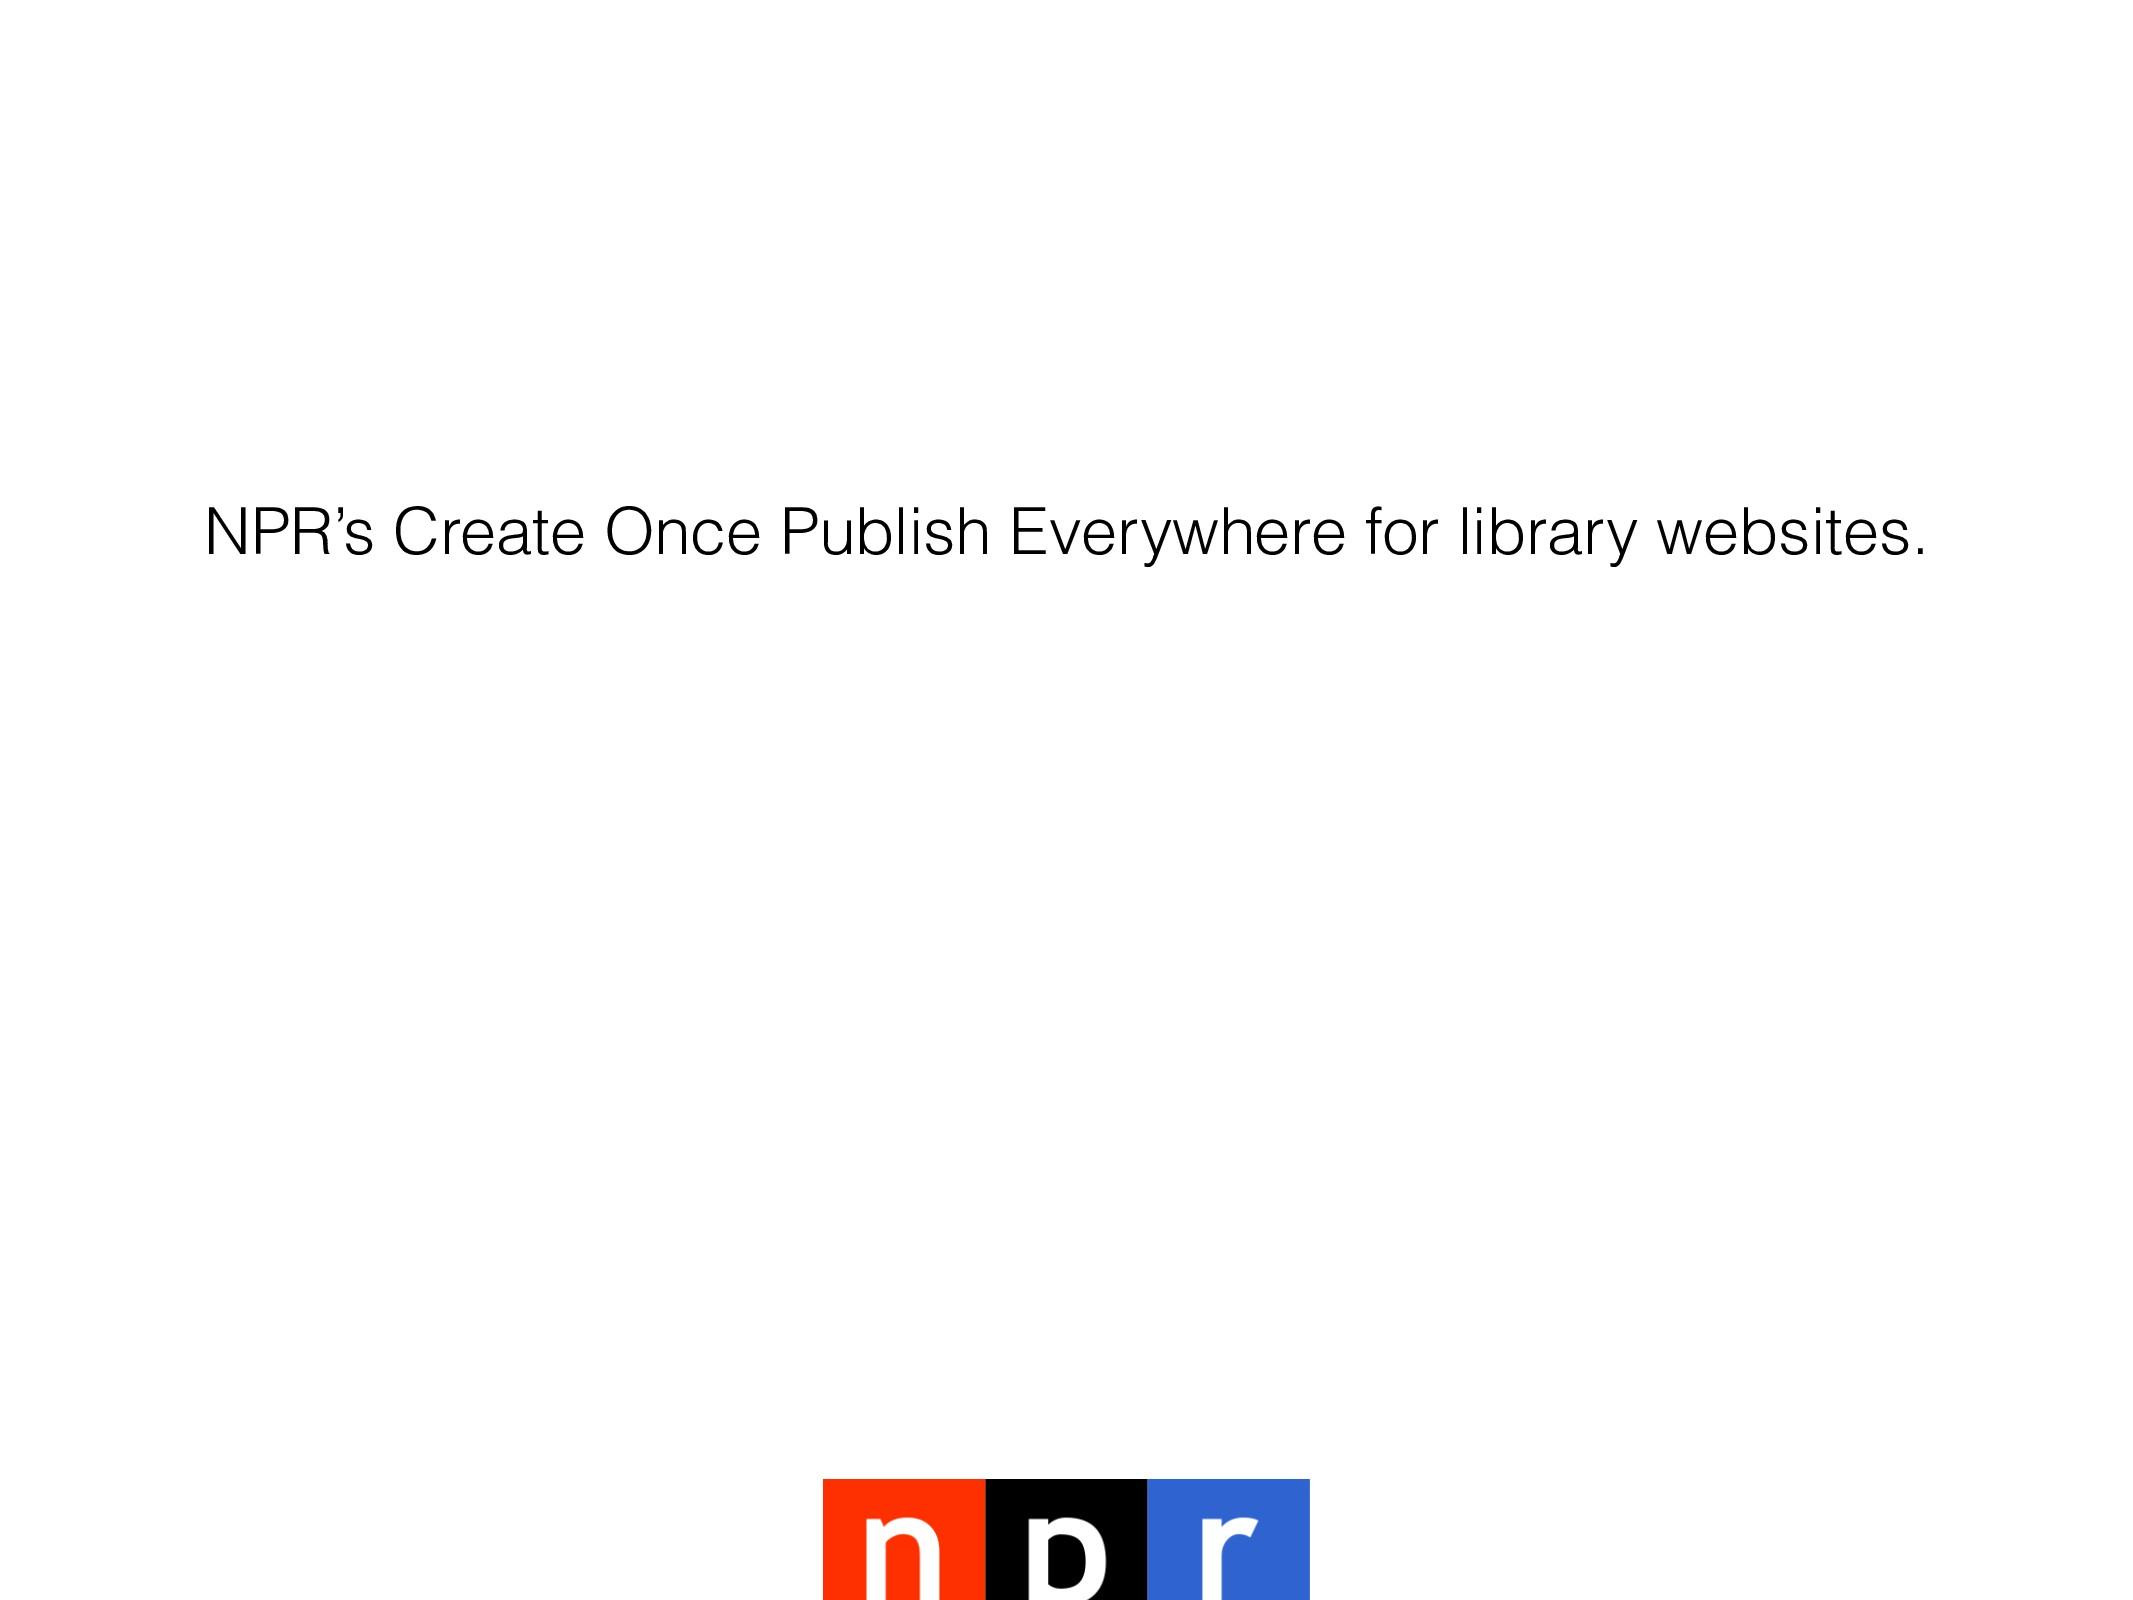 NPR's Create Once Publish Everywhere for librar...